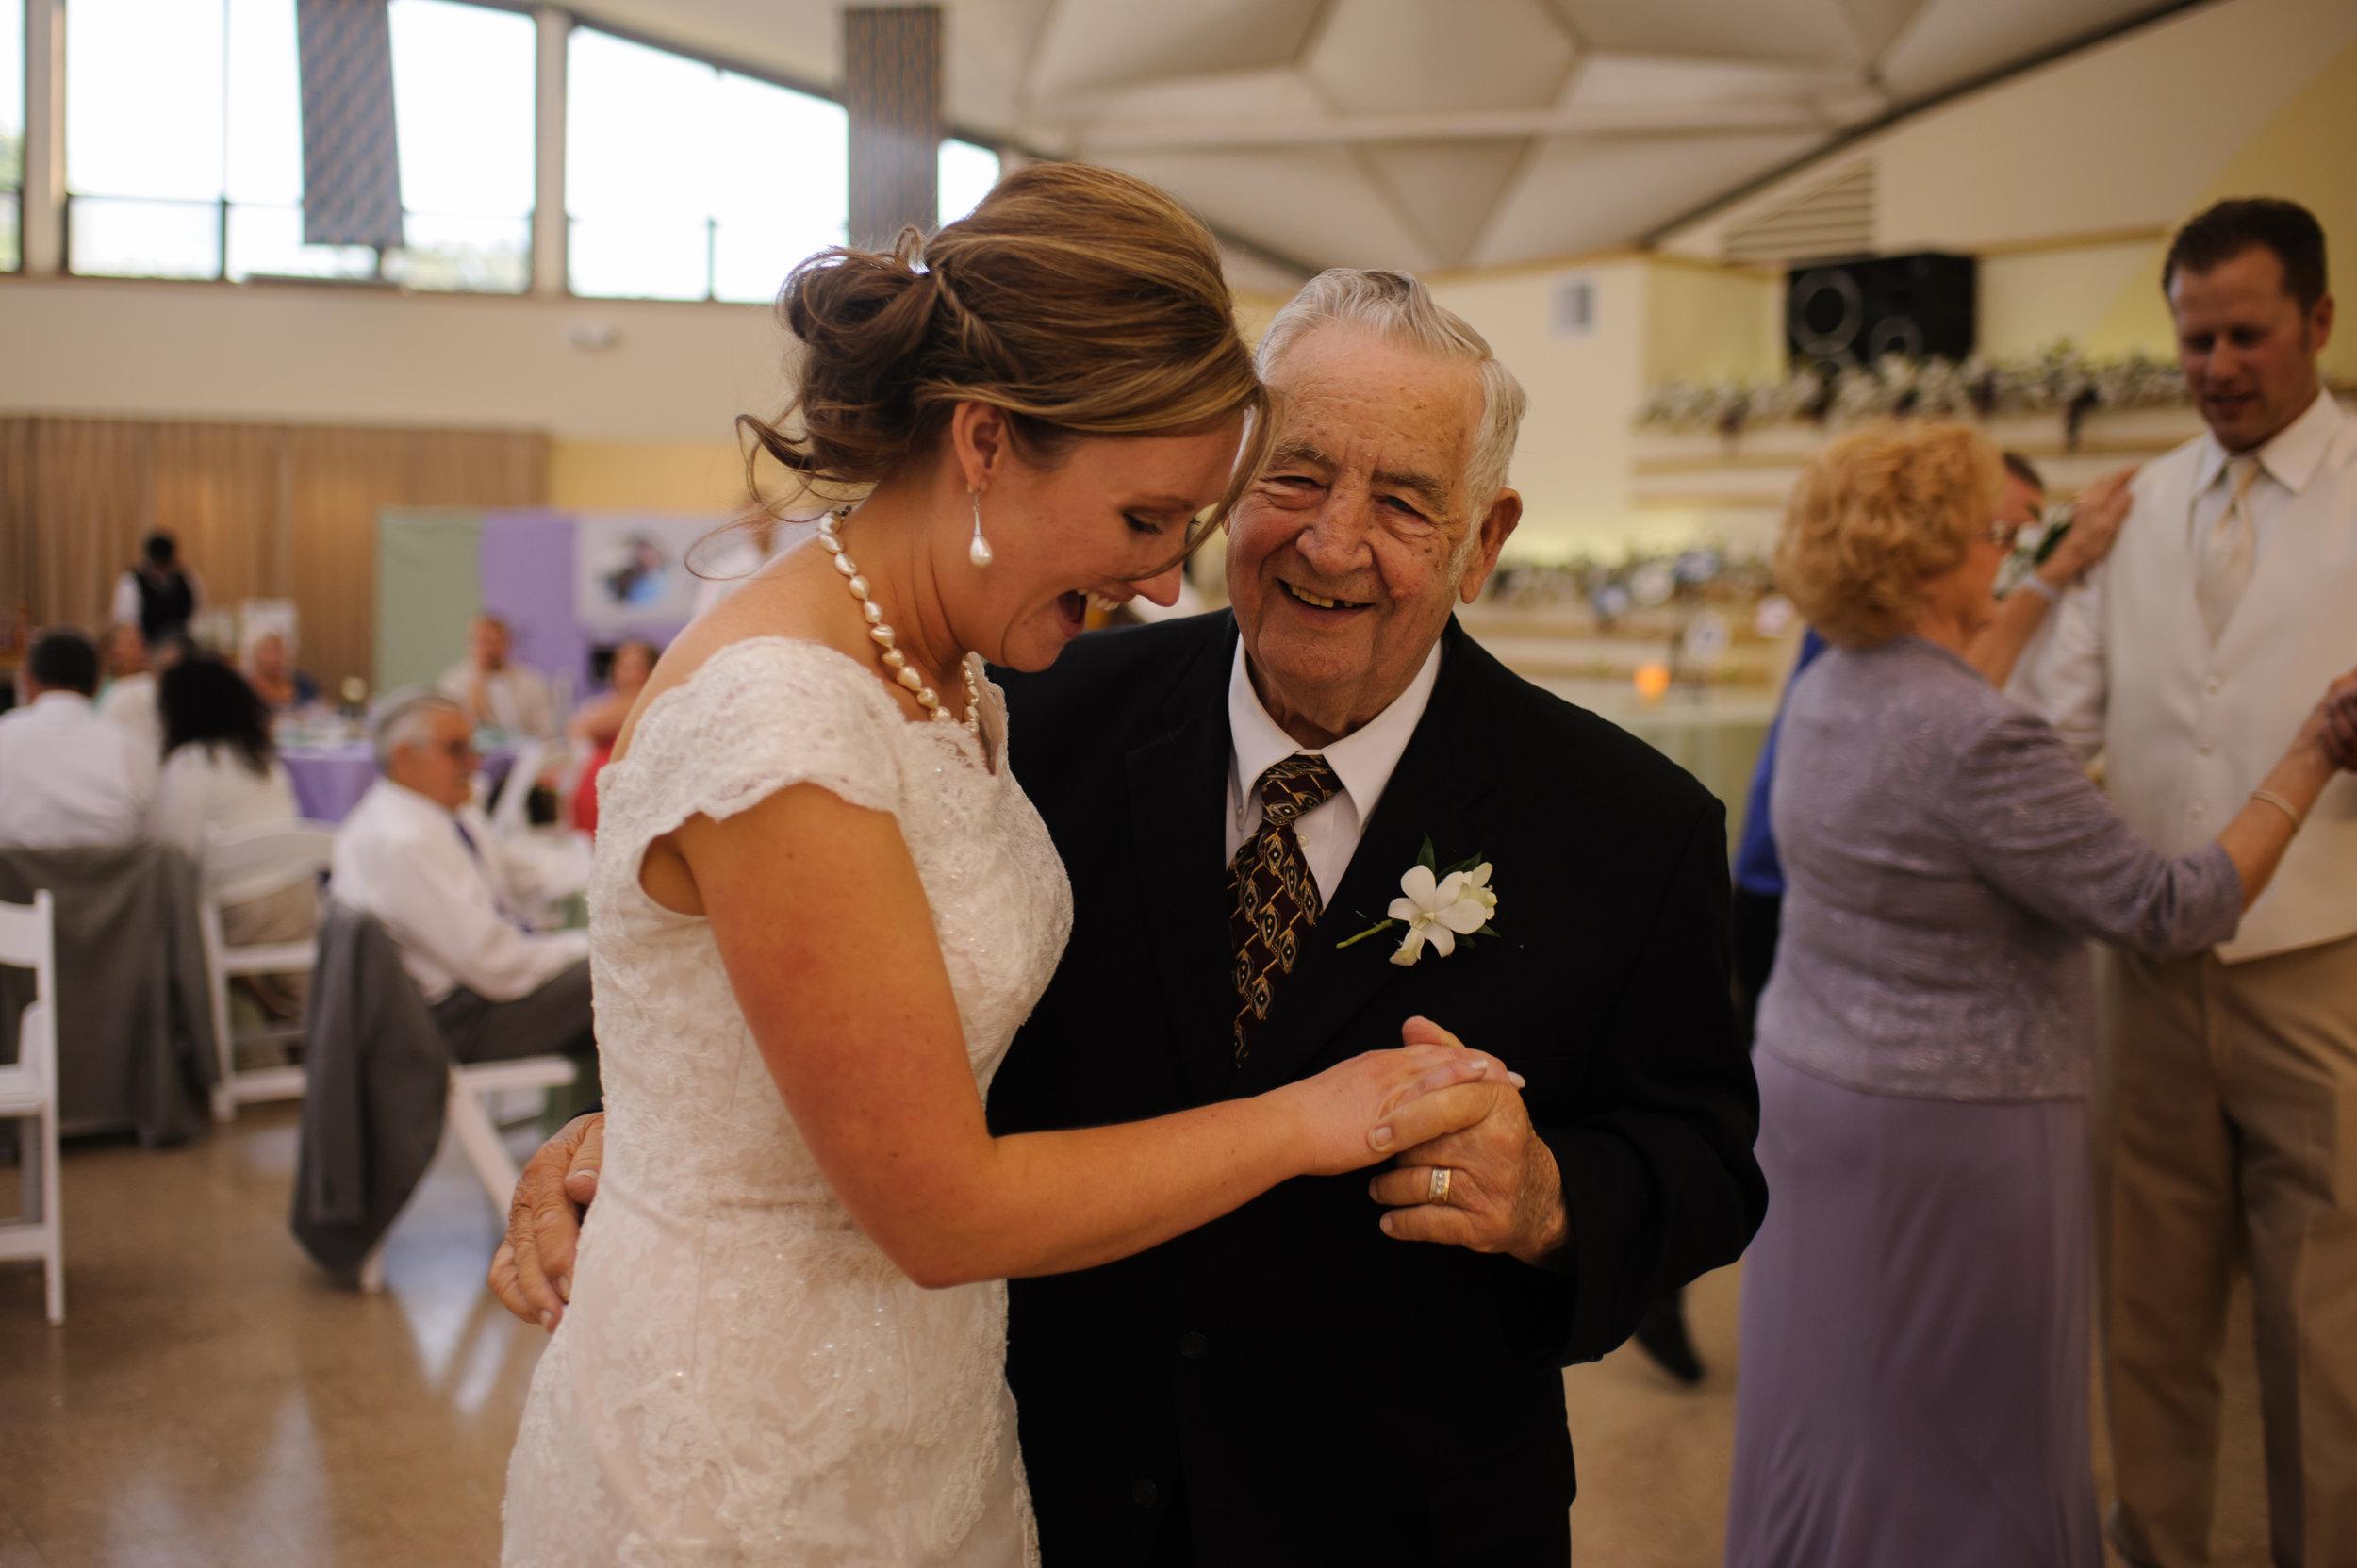 danielle-ross-034-sacramento-wedding-photographer-katherine-nicole-photography.JPG